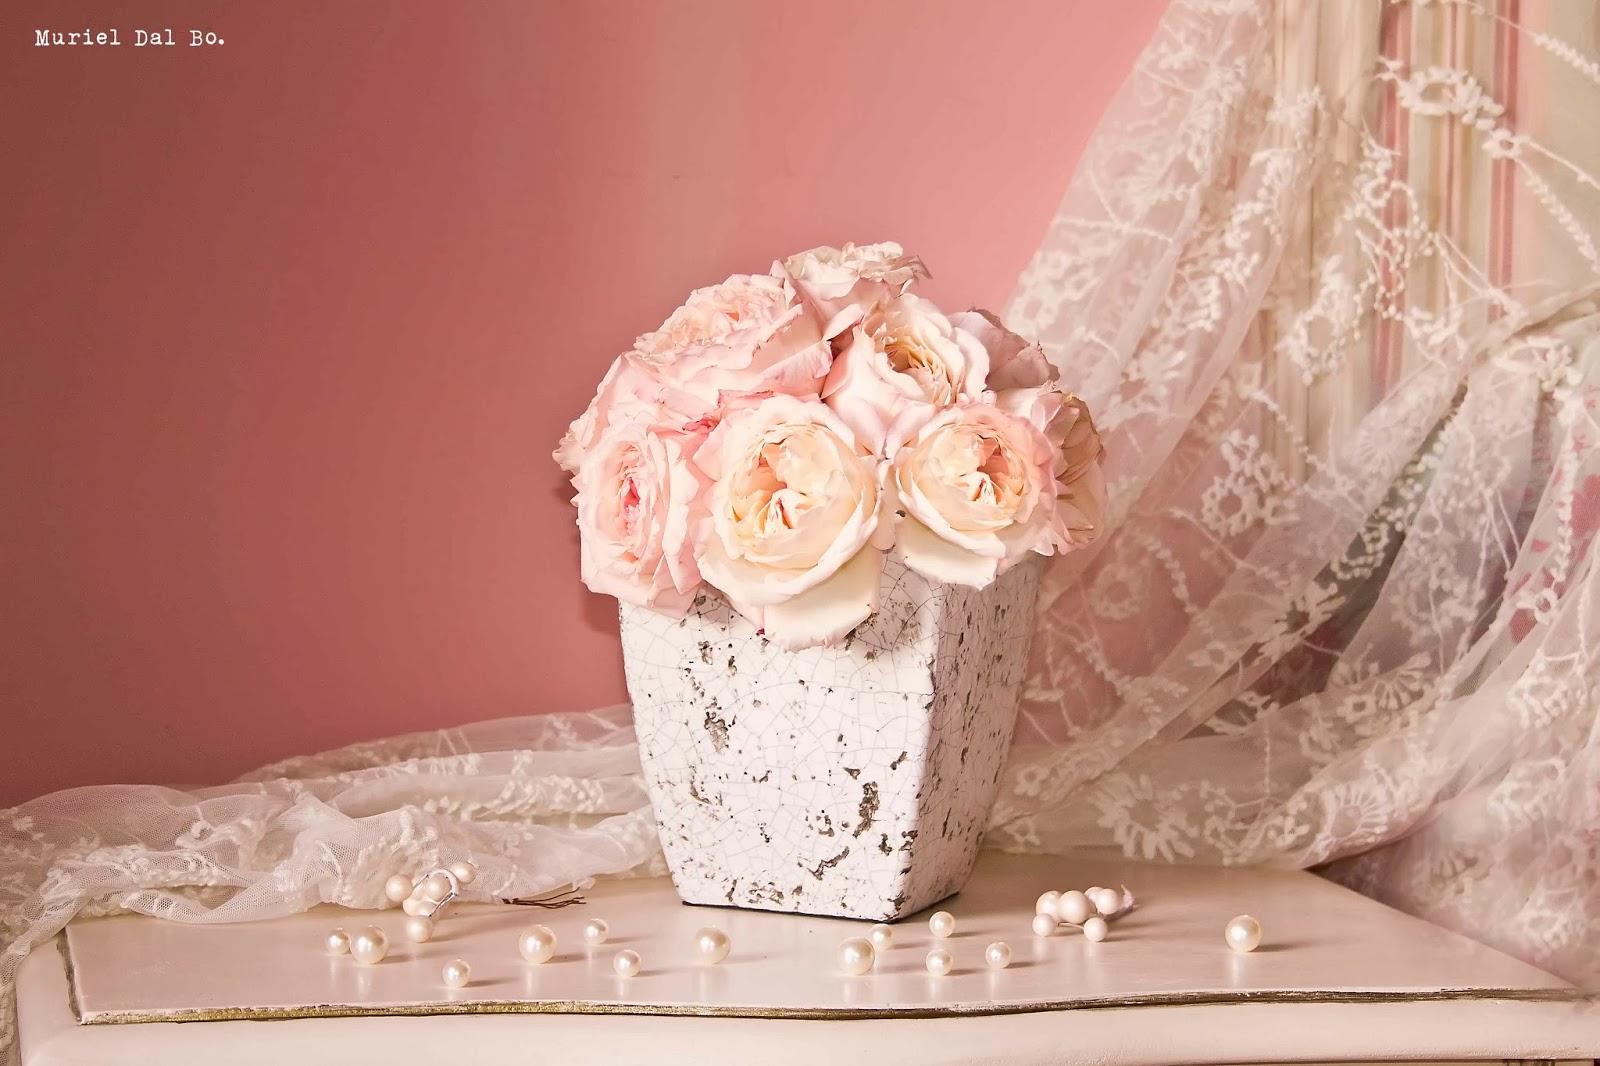 Imagenes de flores que brillen ImagenesHIP com - Imagenes De Flores Que Brillen